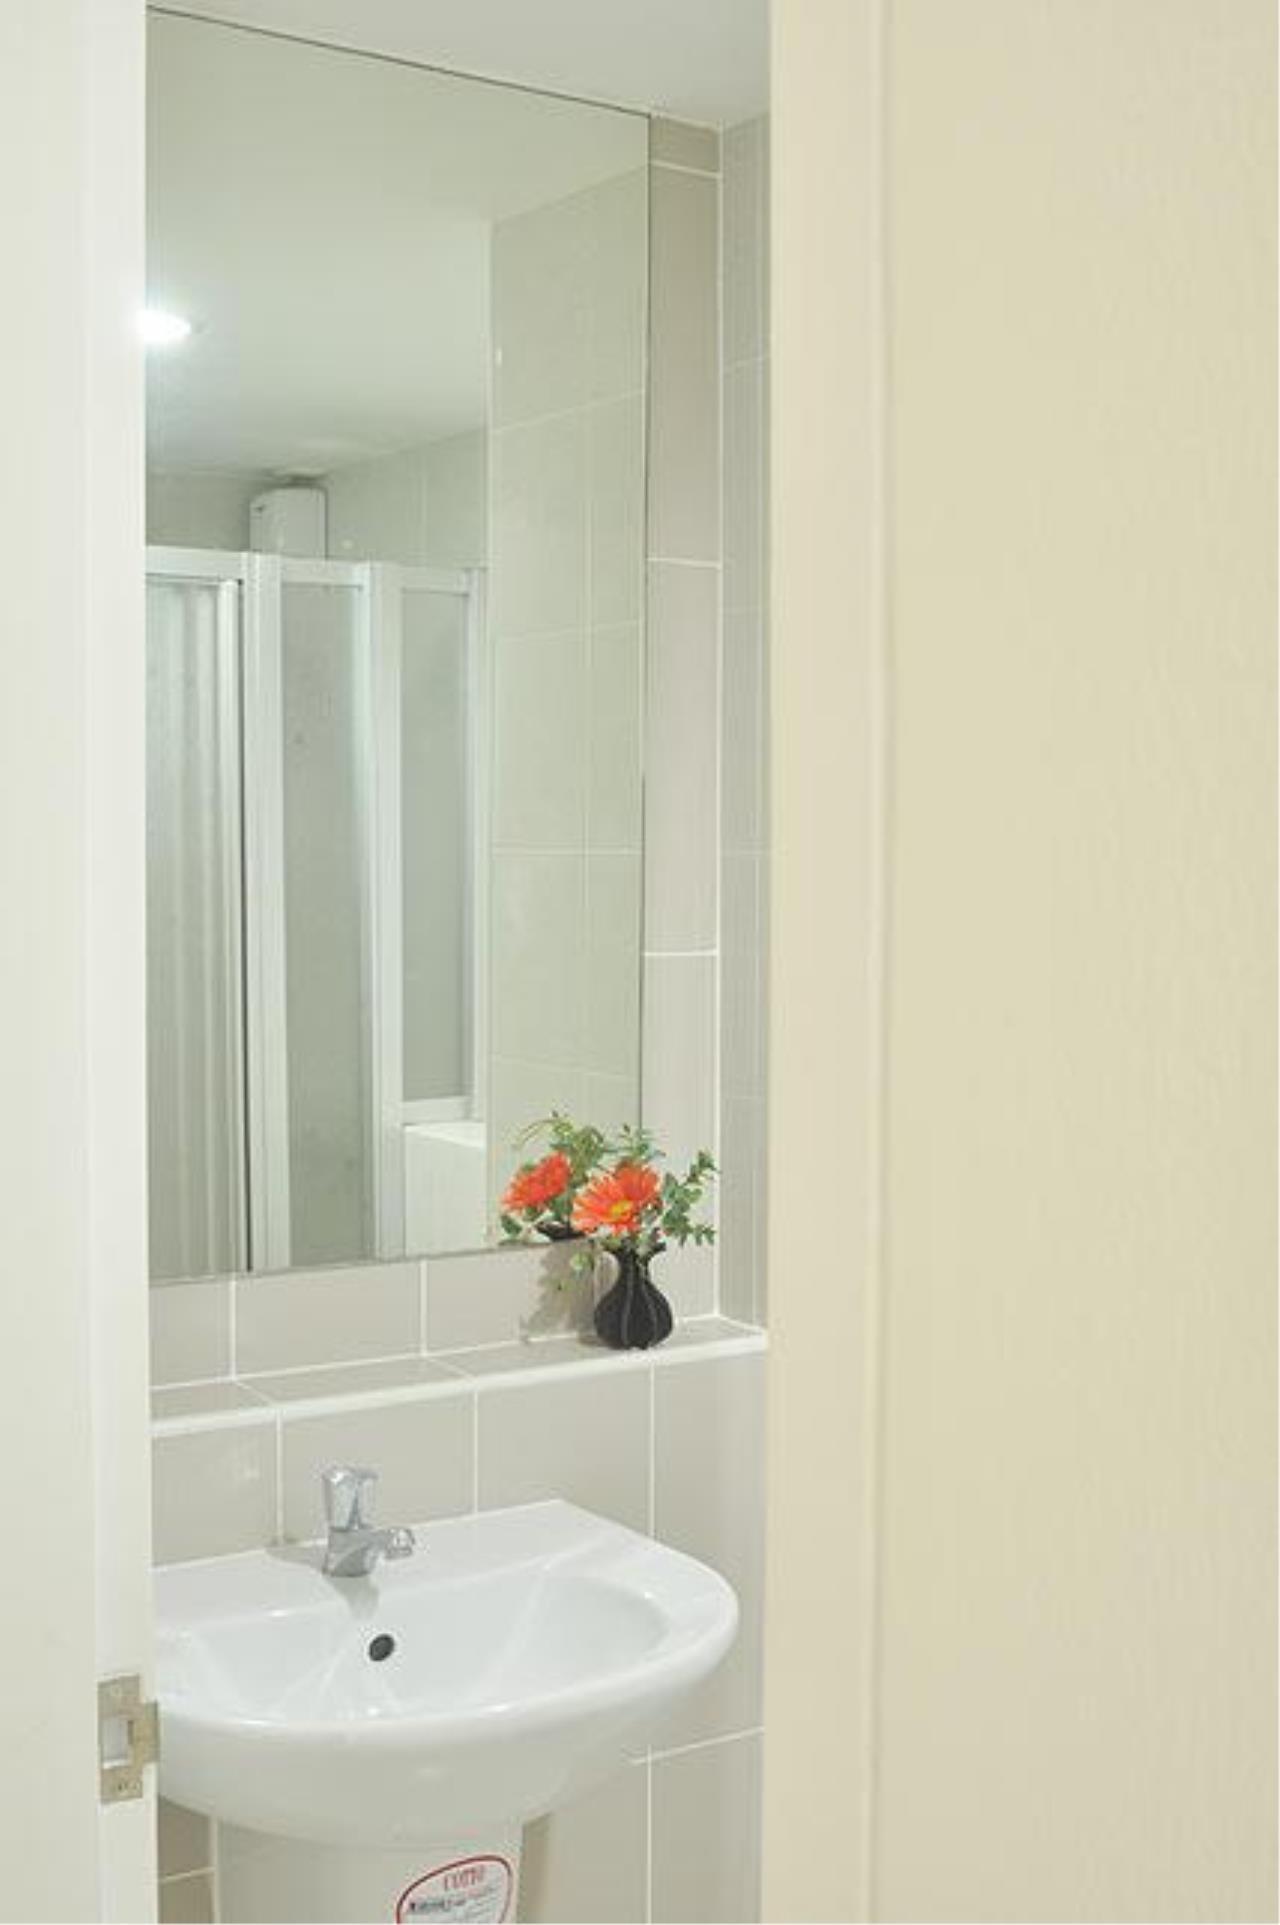 Piri Property Agency's one bedroom  For Rent Condo One - Sukhumvit 67 7